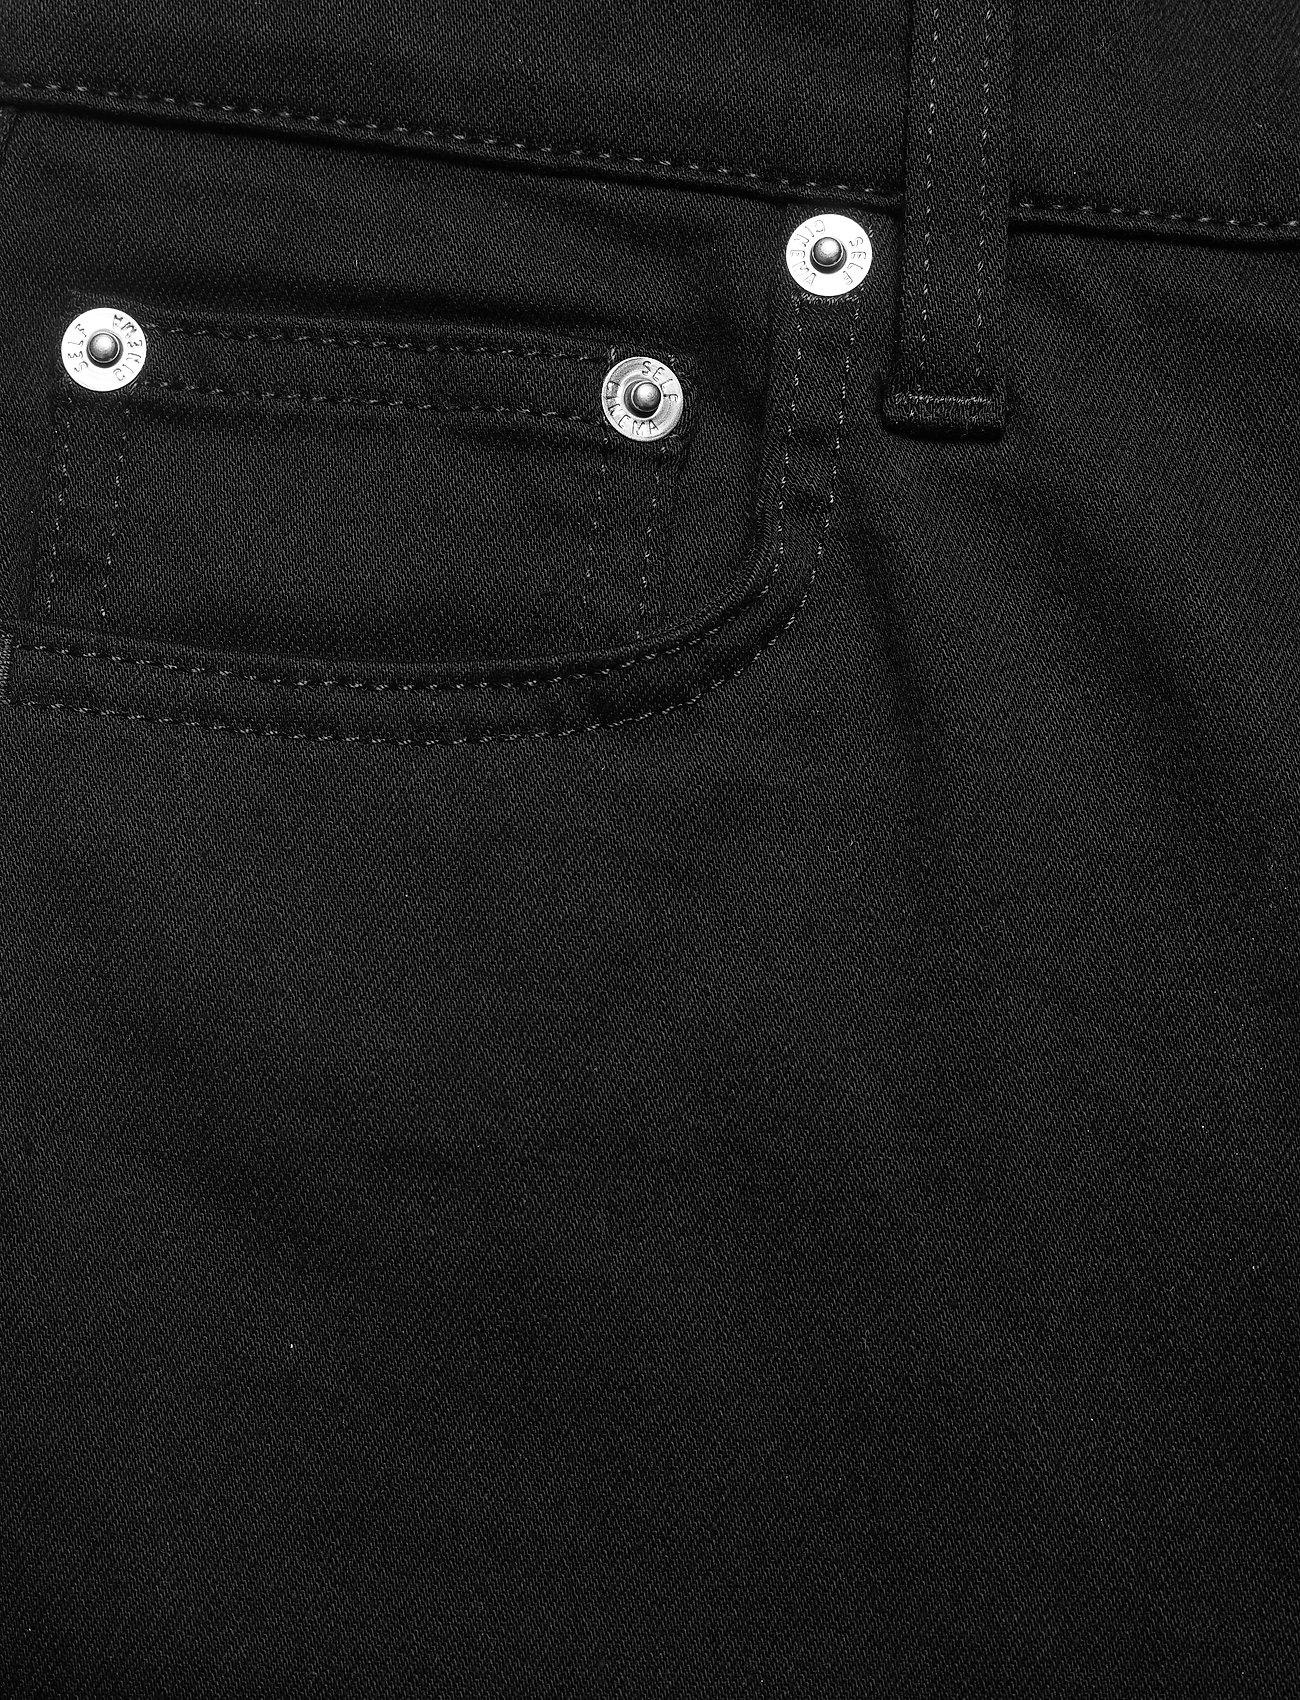 Self Cinema - Womens Skinny Jean - skinny jeans - stay black - 2